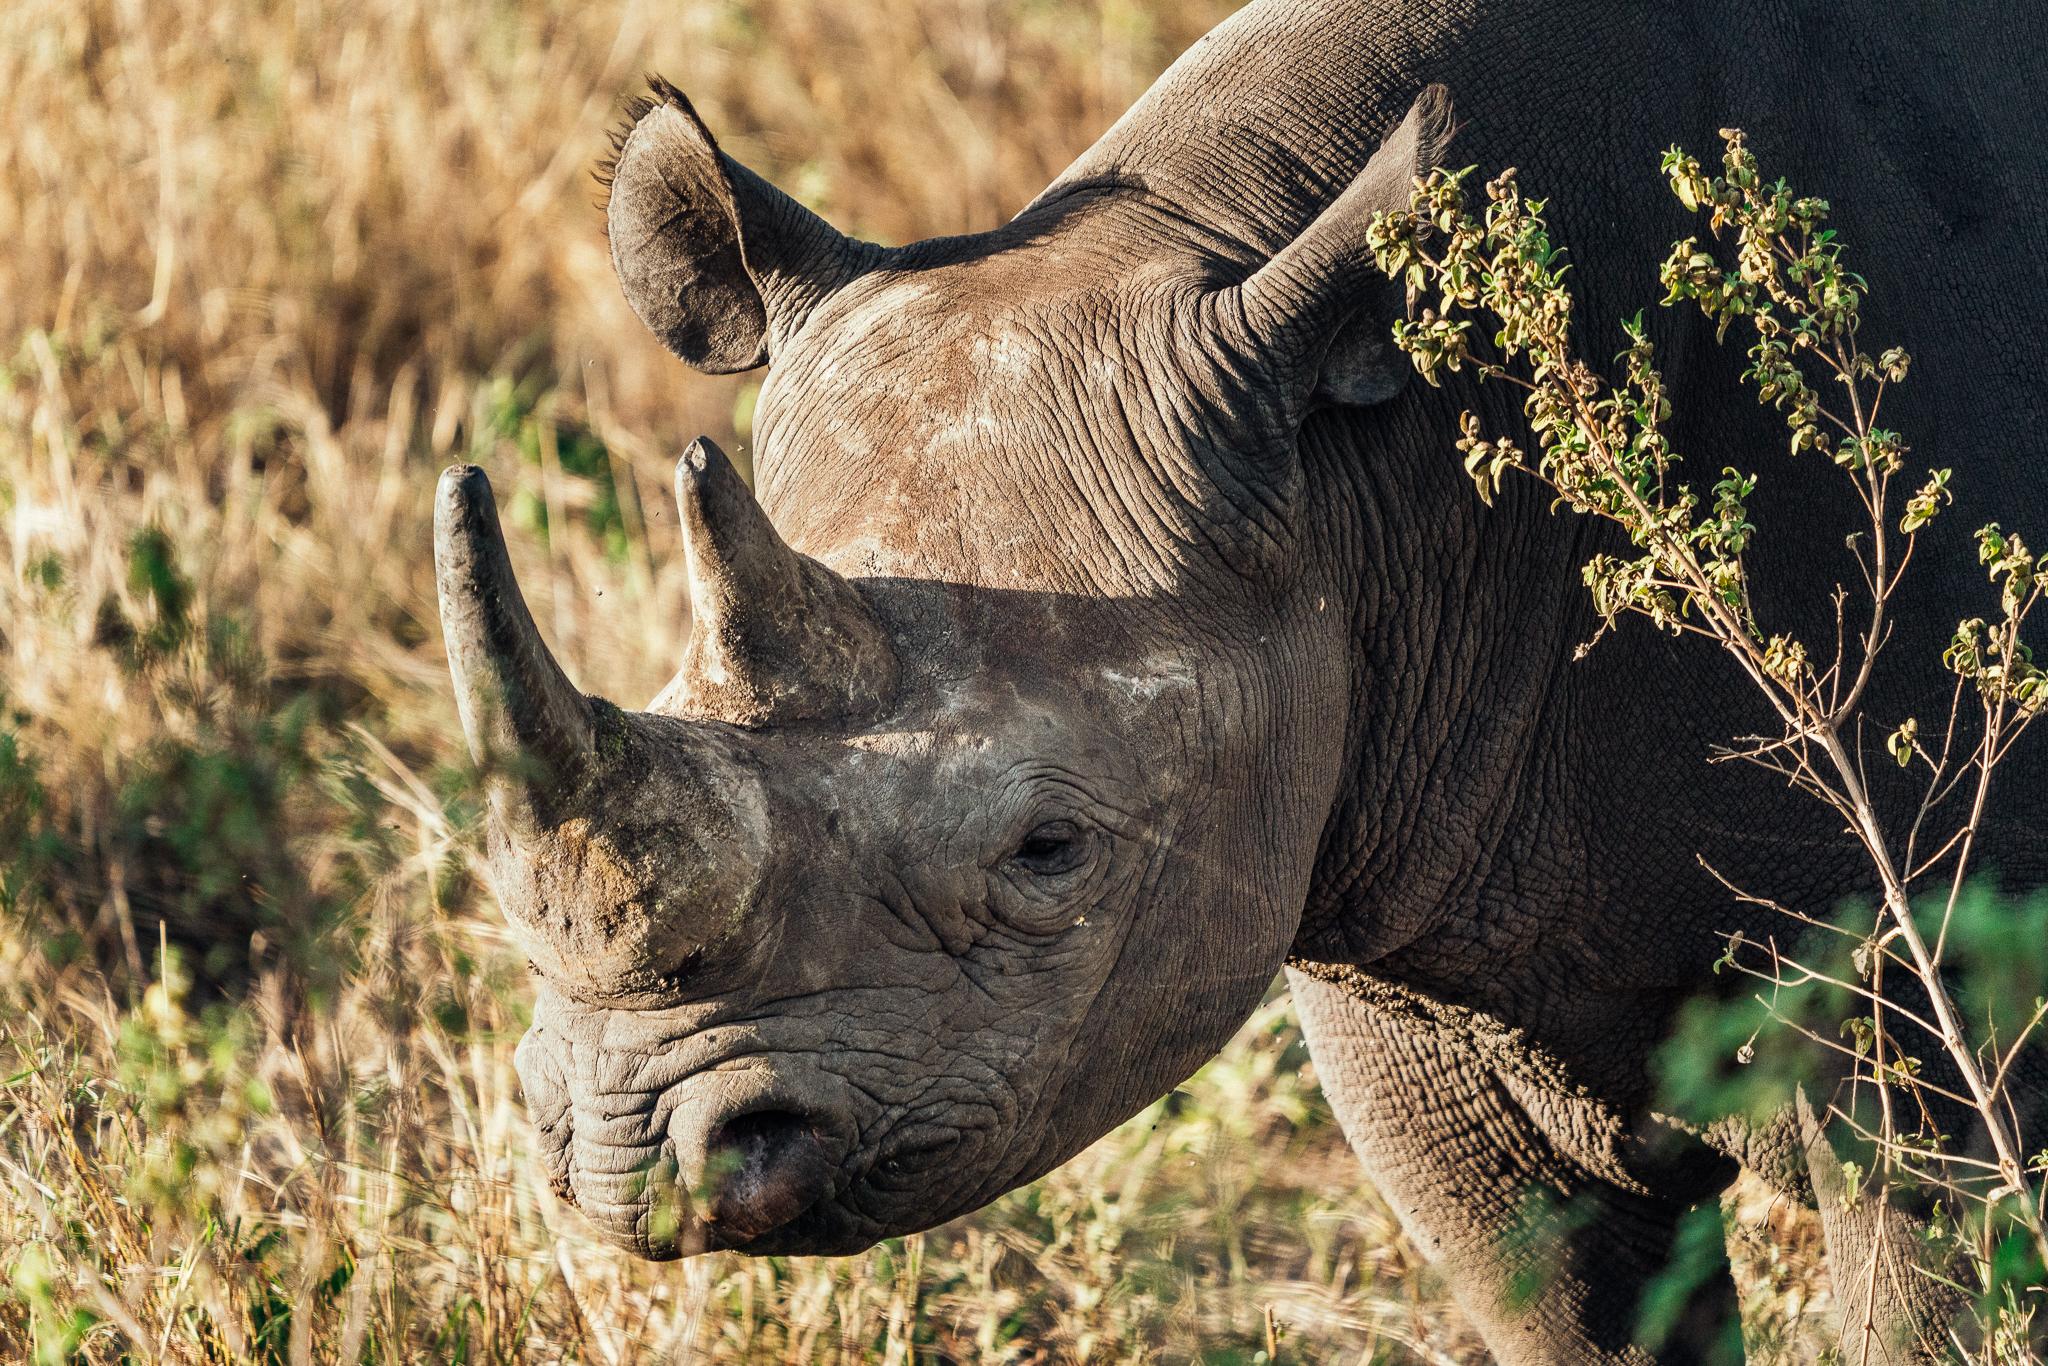 Rhino in the Maasai Mara Ph. Dave Krugman